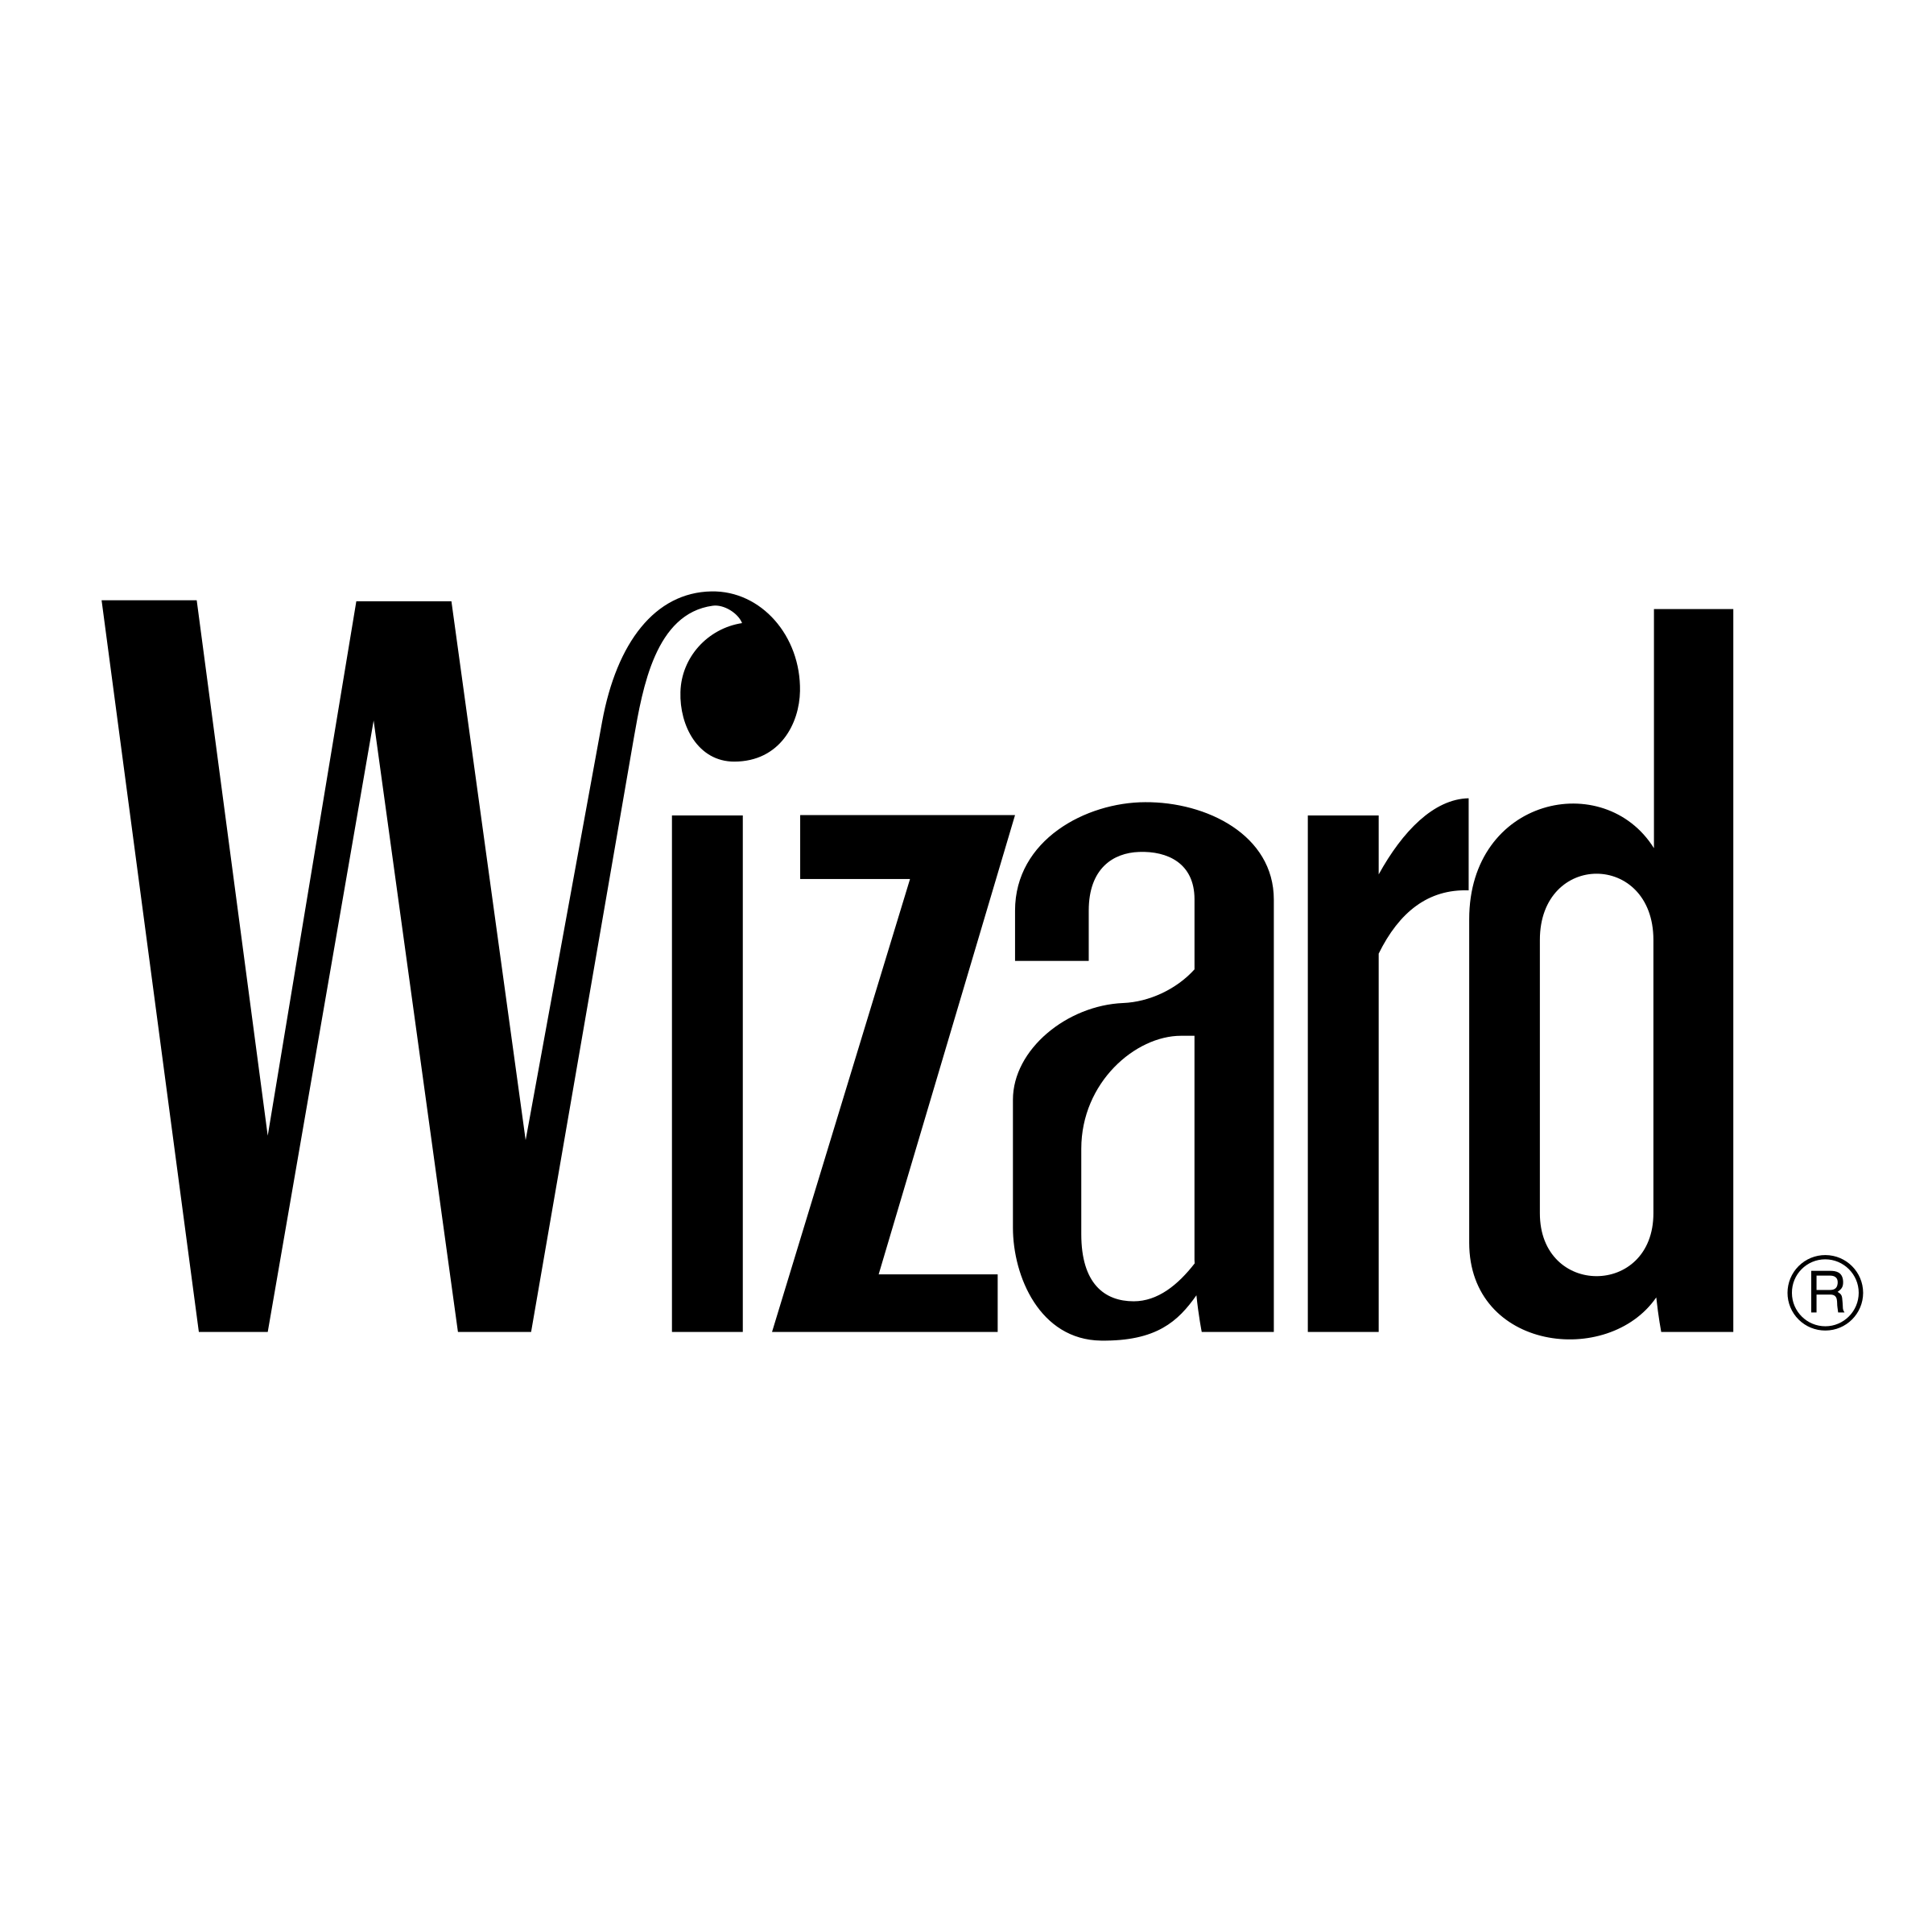 Wizard Logo PNG Transparent & SVG Vector.